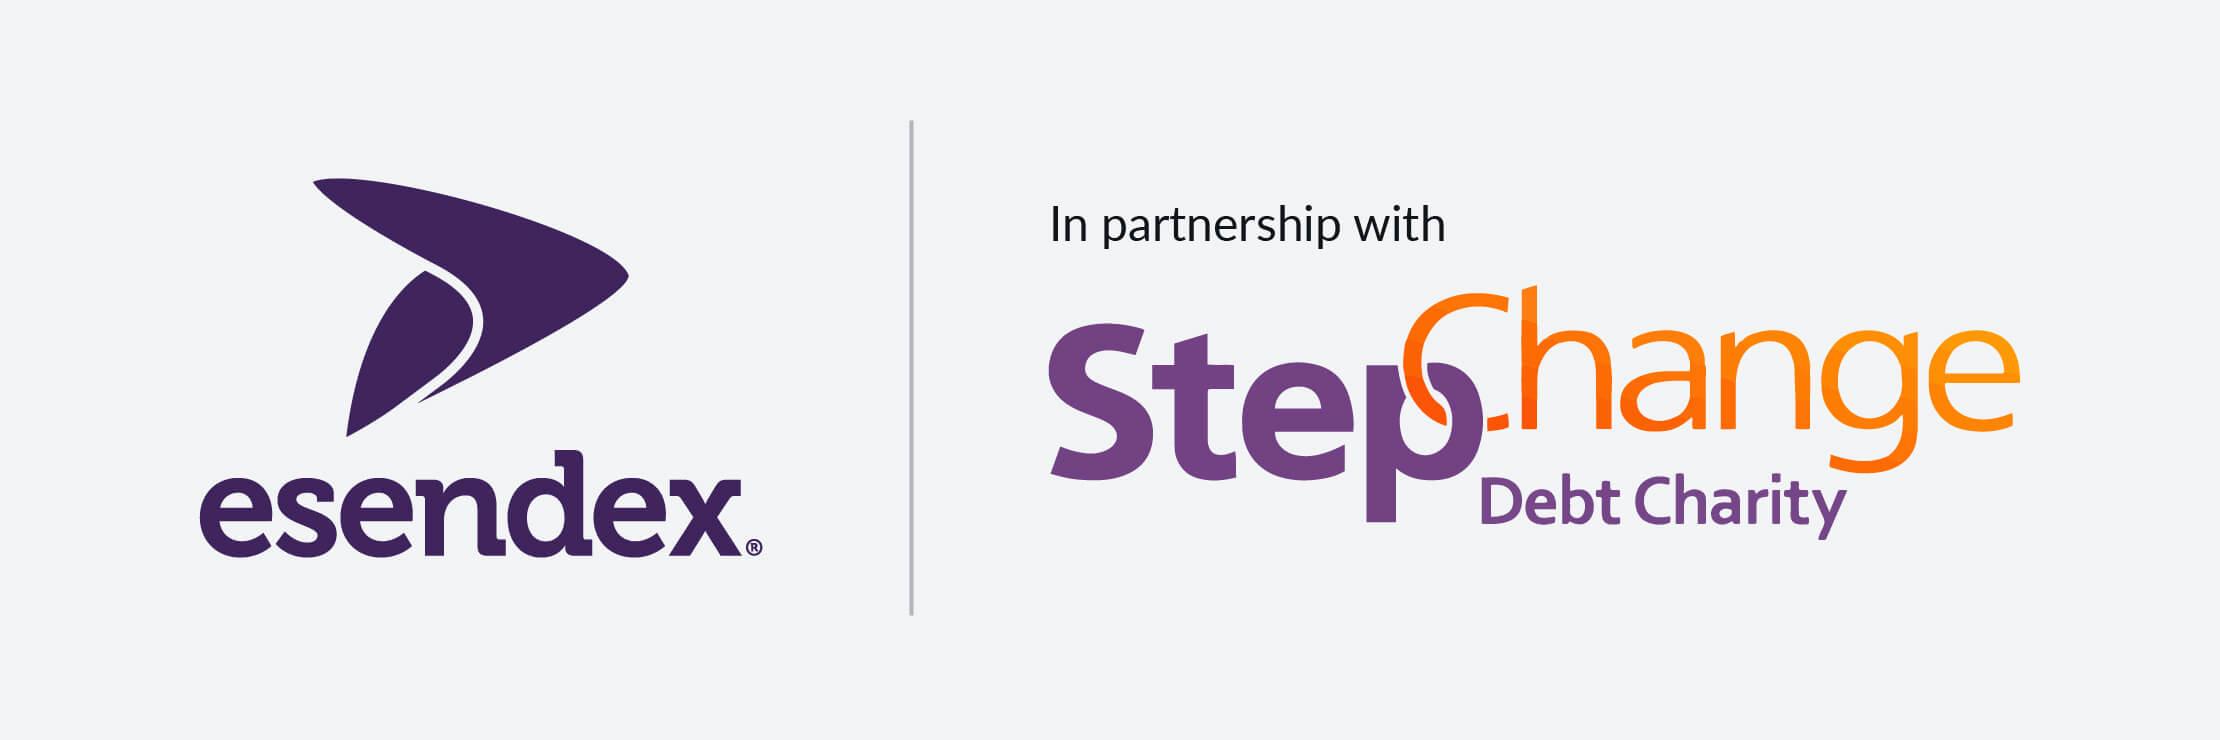 Esendex partners with StepChange